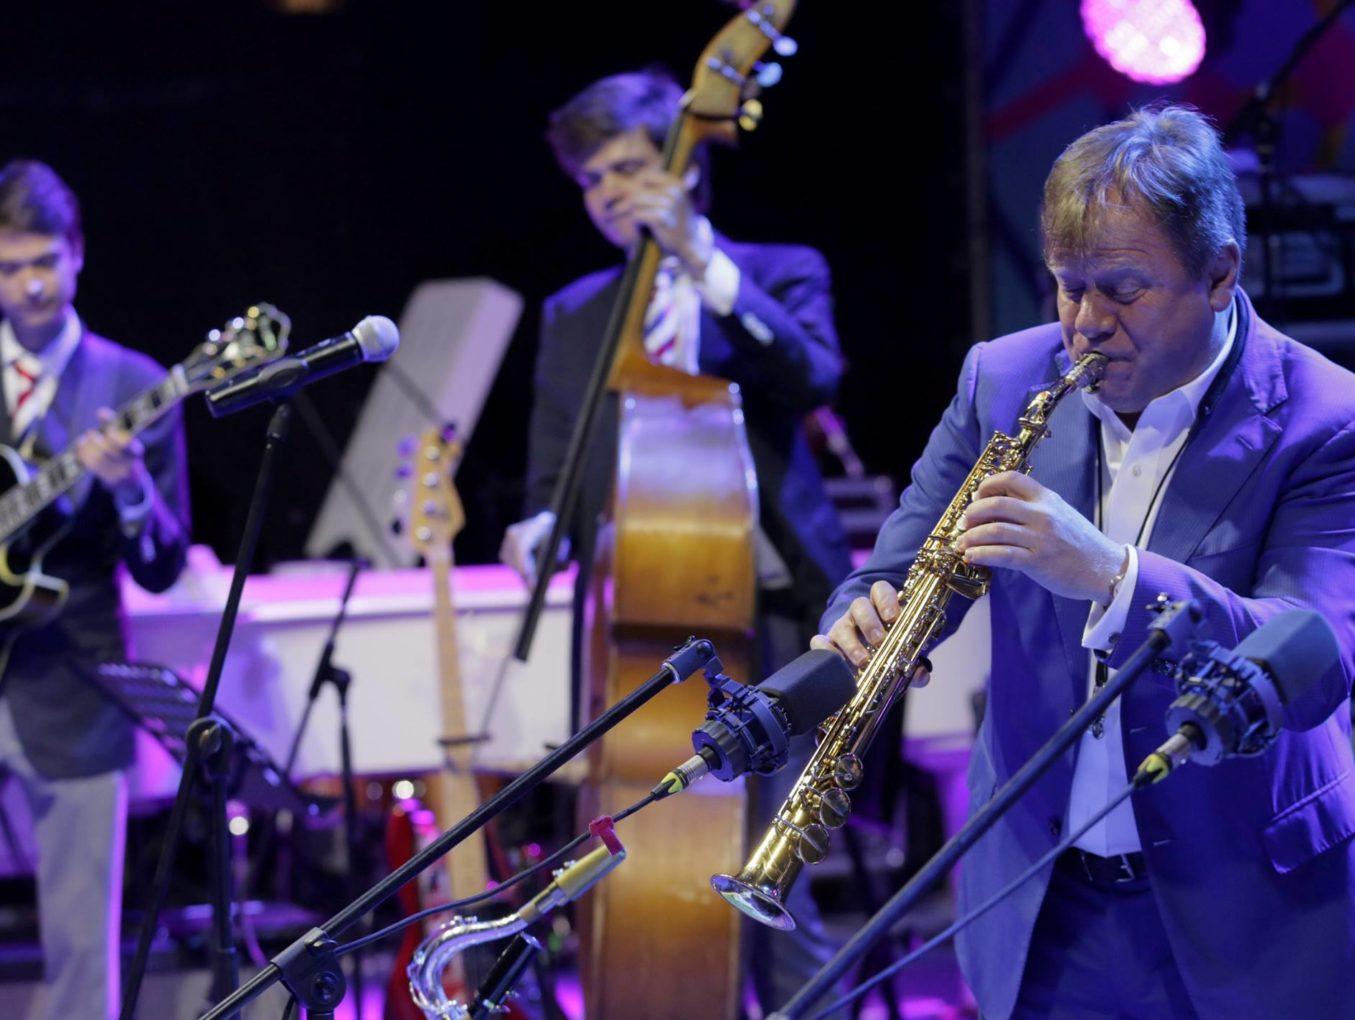 Jazz Parking стал информационным партнером музыкального фестиваля Skolkovo Jazz Science